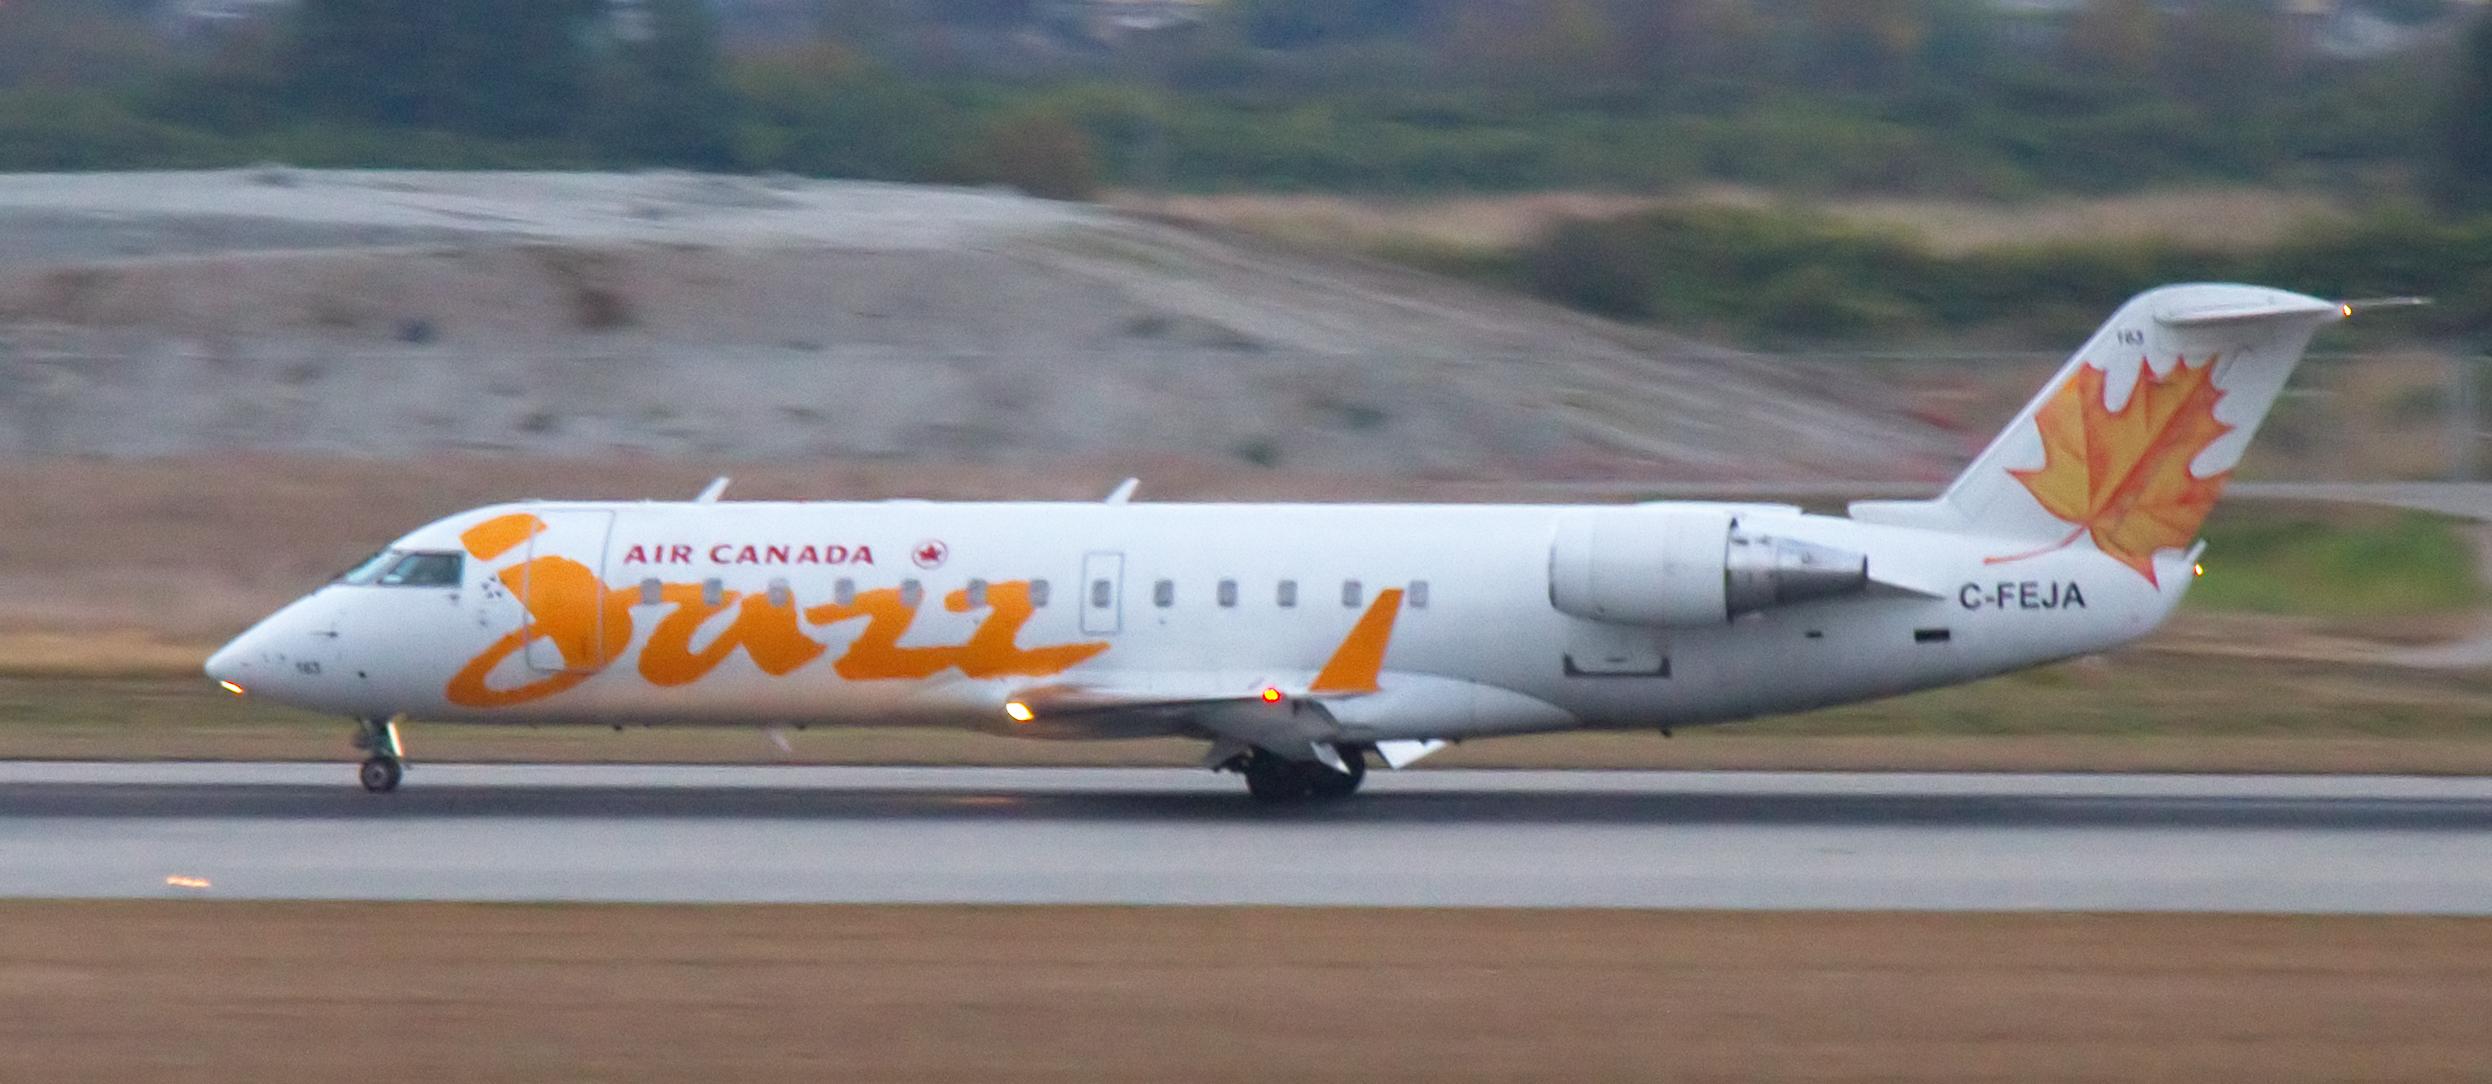 Canadair jet 200 фото